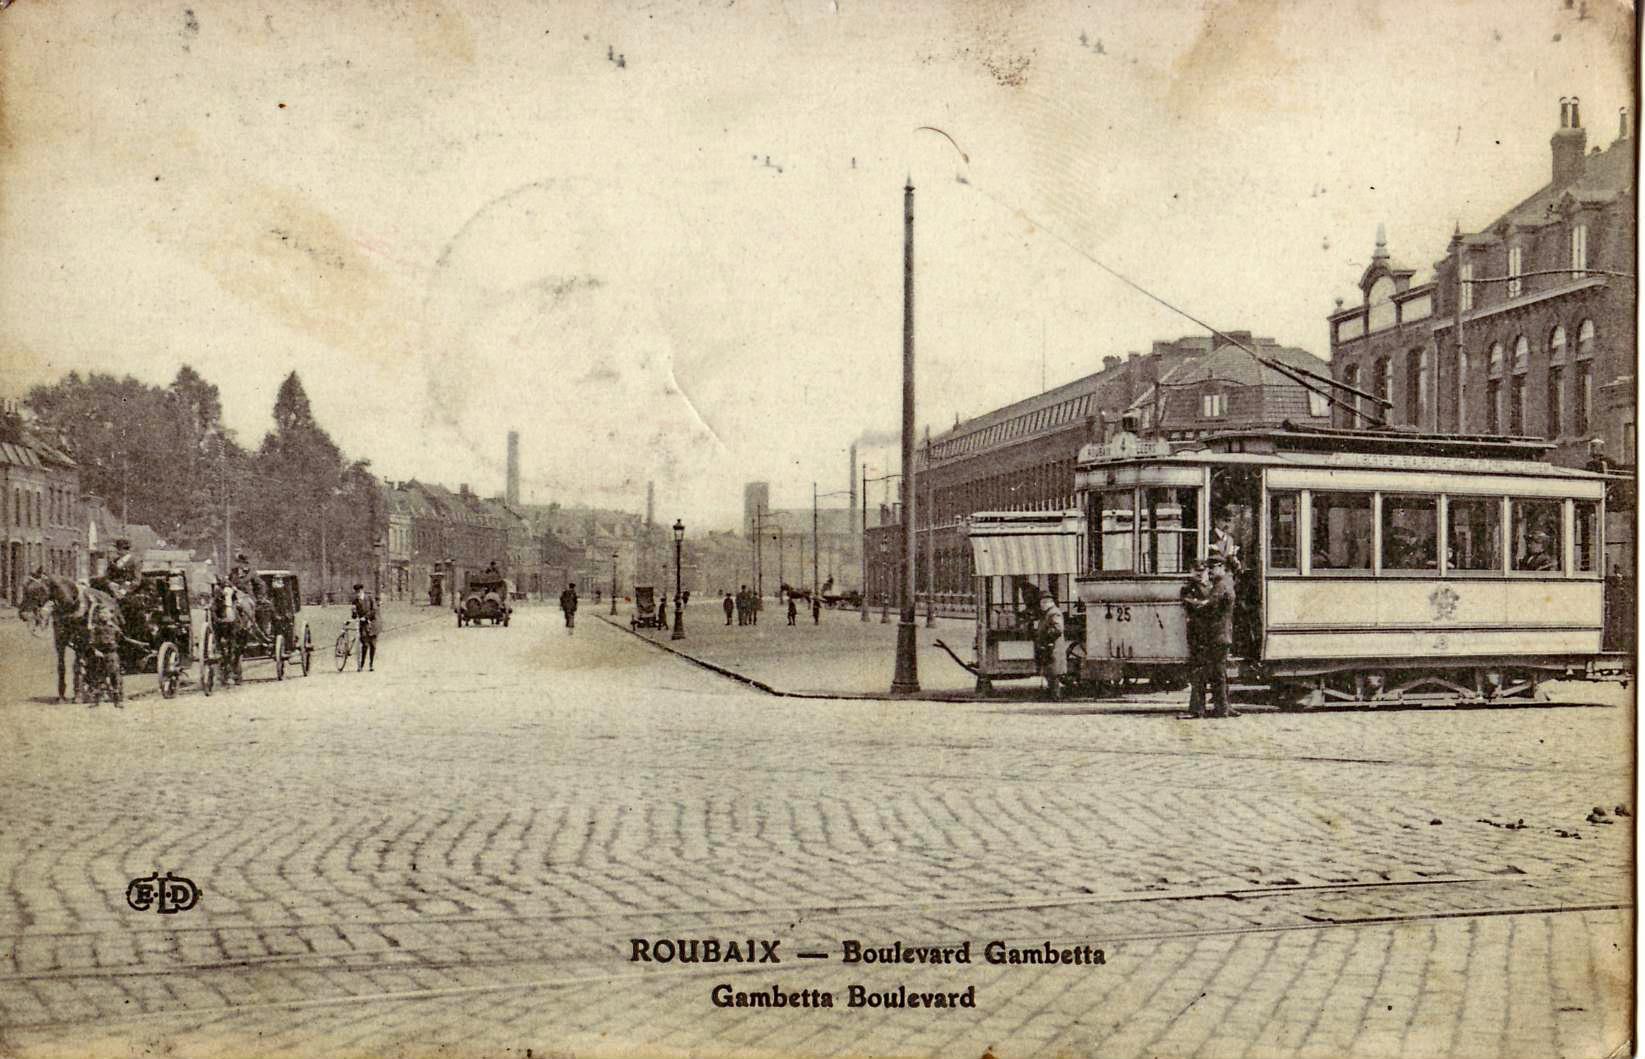 Fichier eld roubaix boulevard gambetta jpg wikip dia - Boulevard gambetta roubaix ...